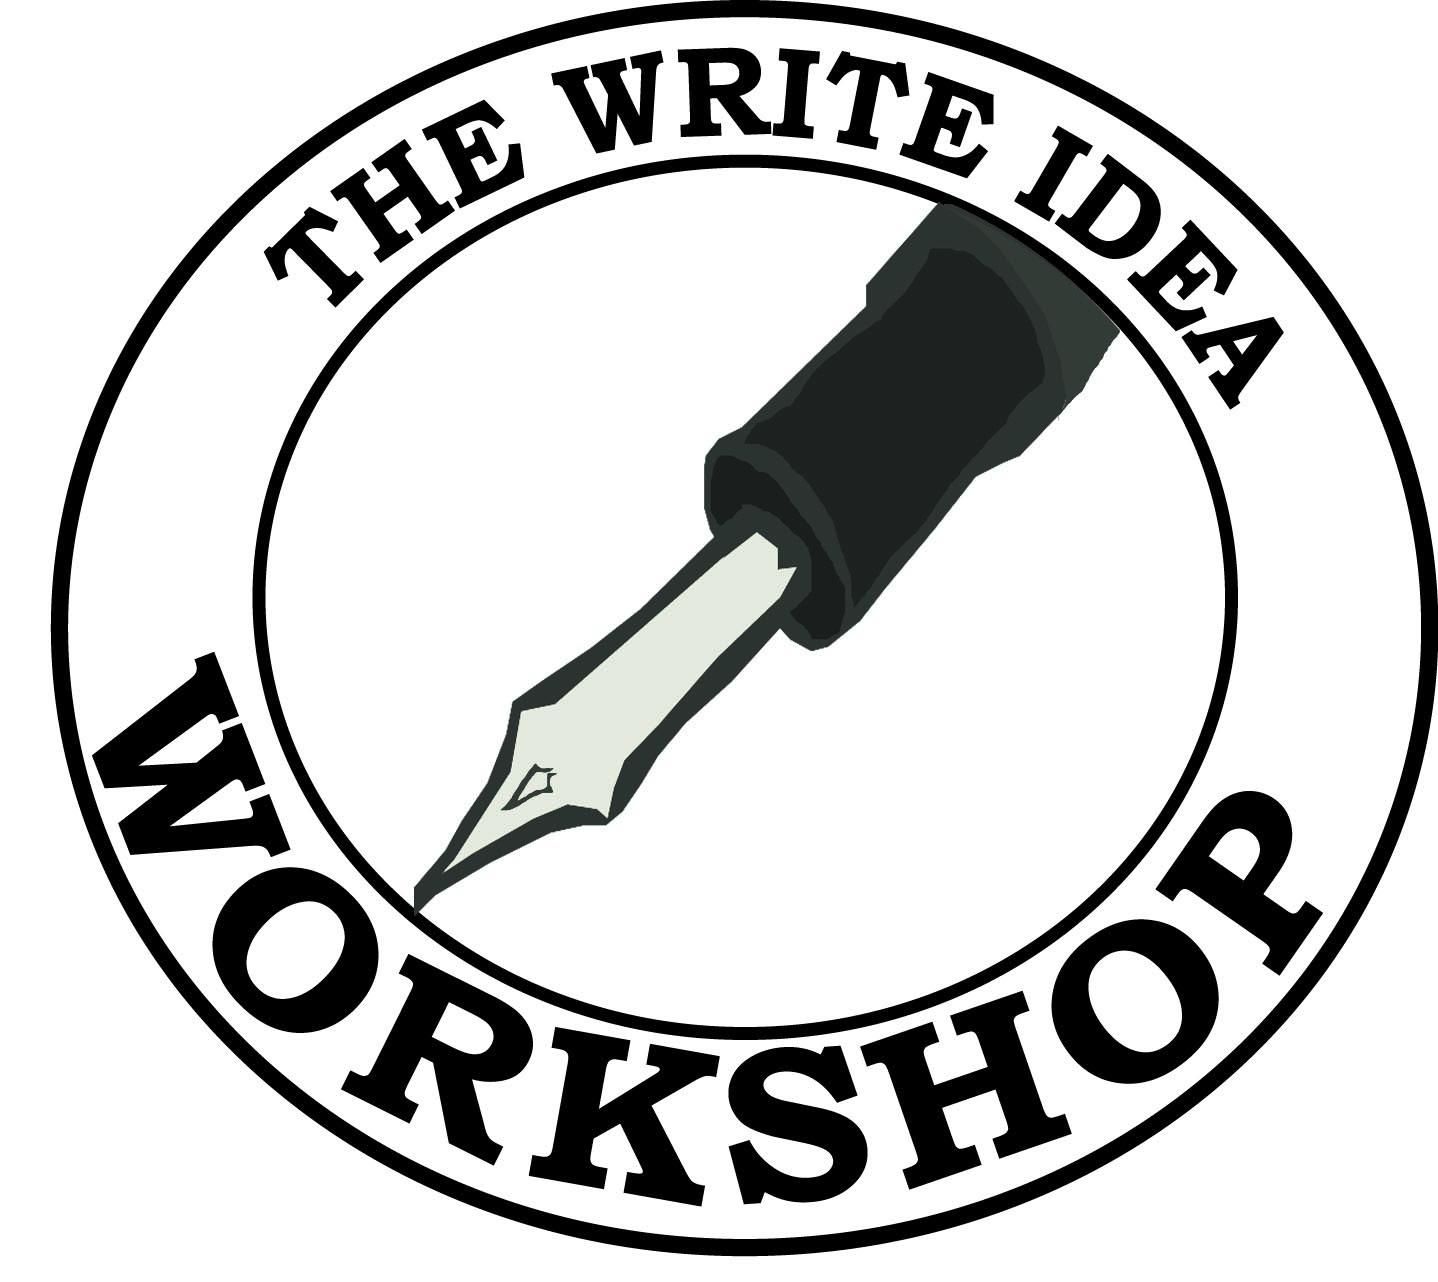 038 - The Write Idea Workshop - Chicago Mash